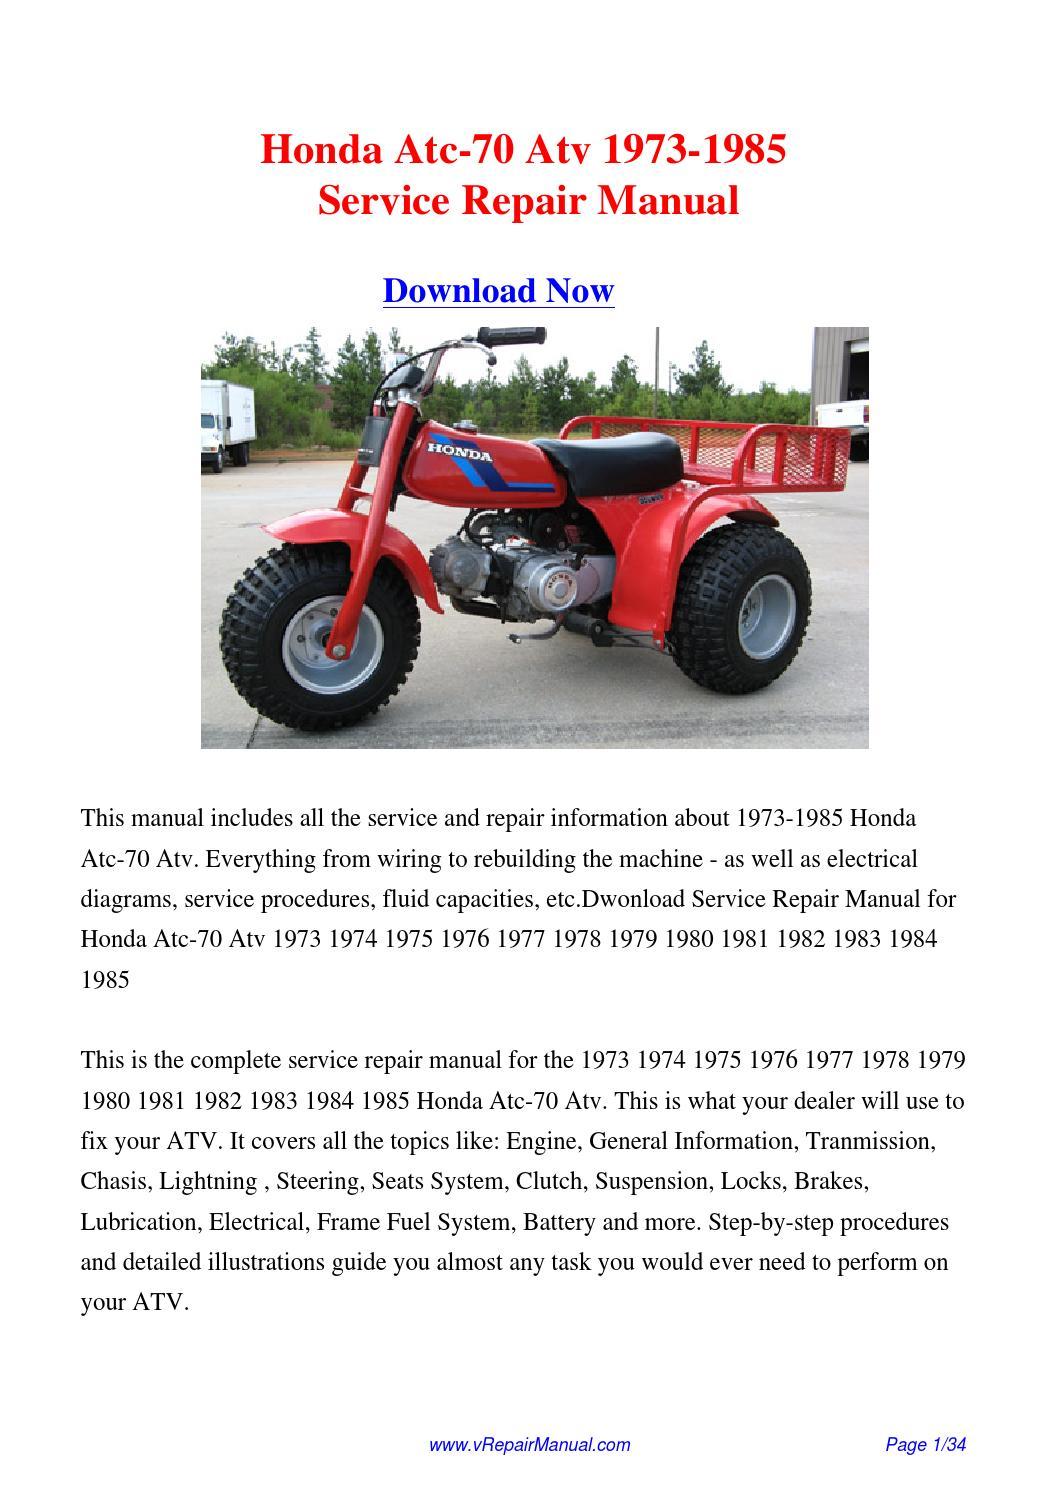 Honda Atc70 1973 1985 Repair Manual Manual Guide